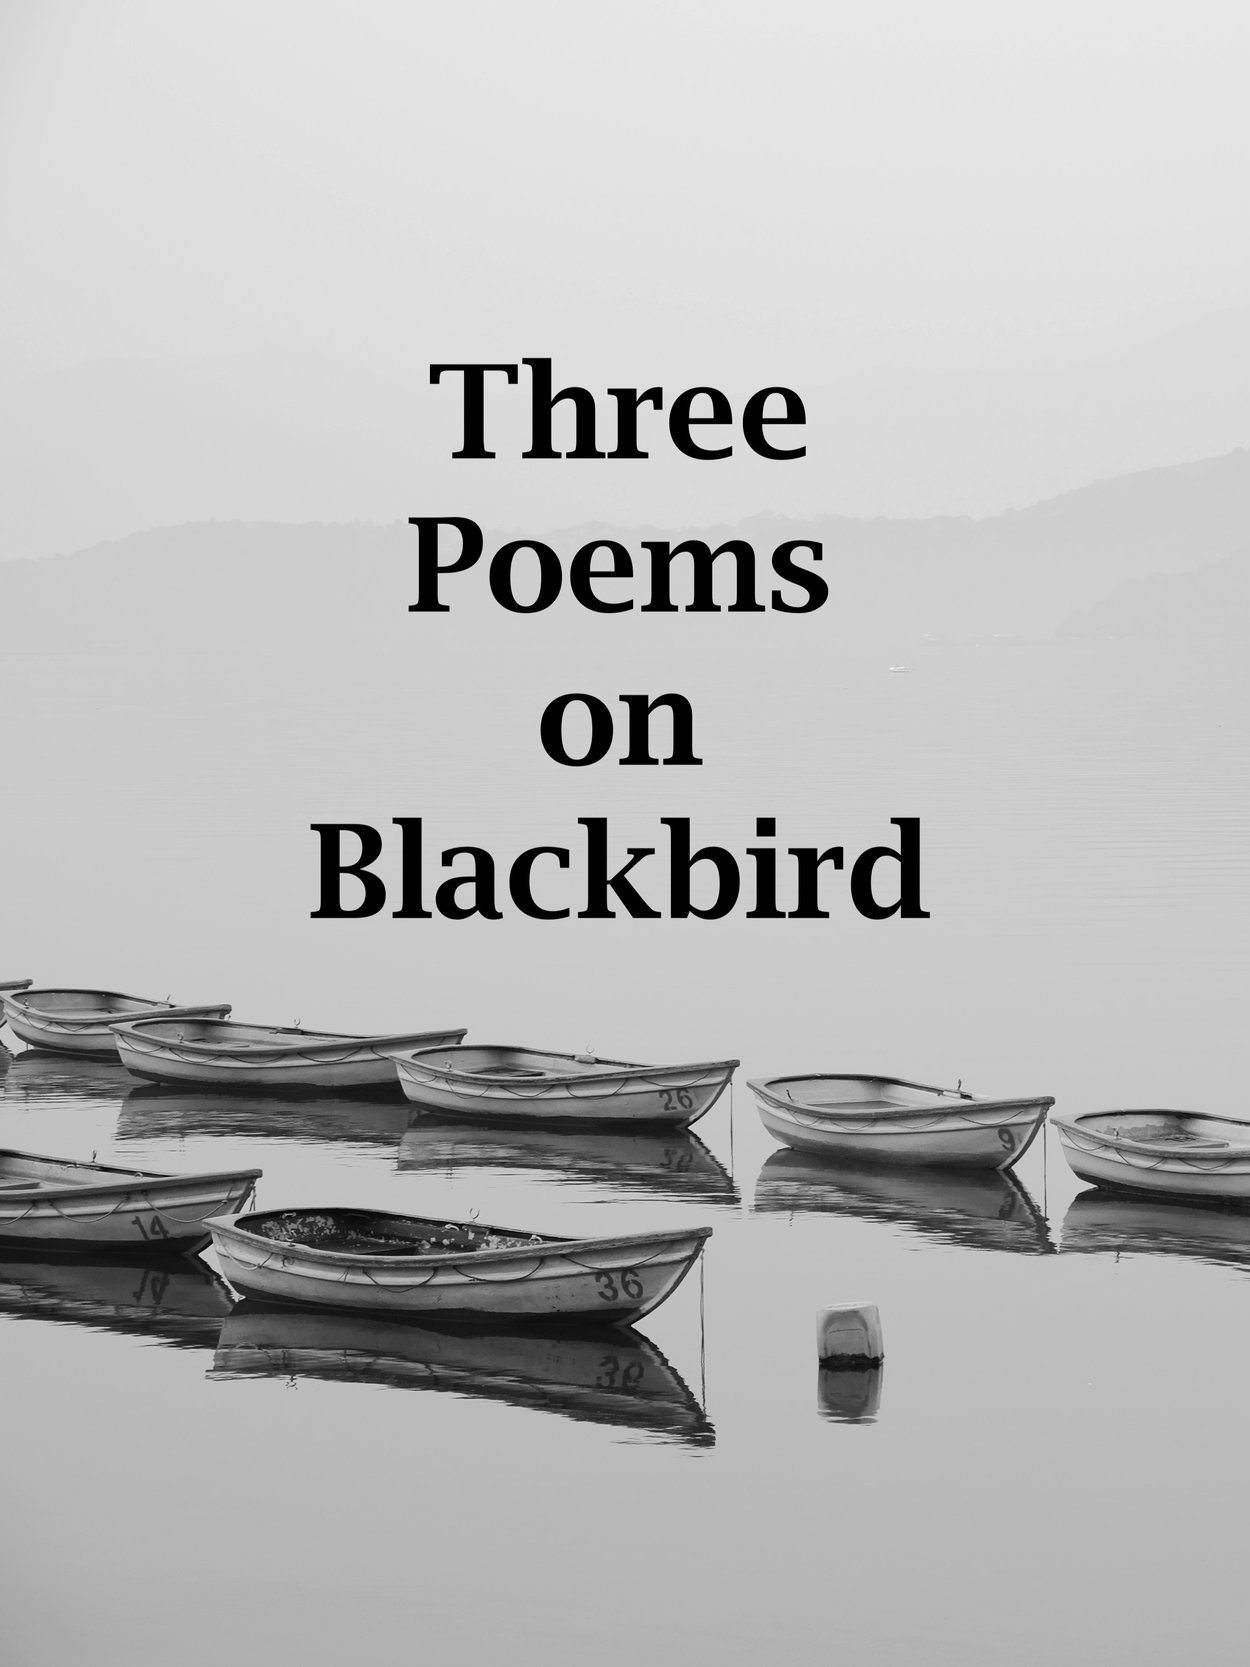 Three Poems on Blackbird